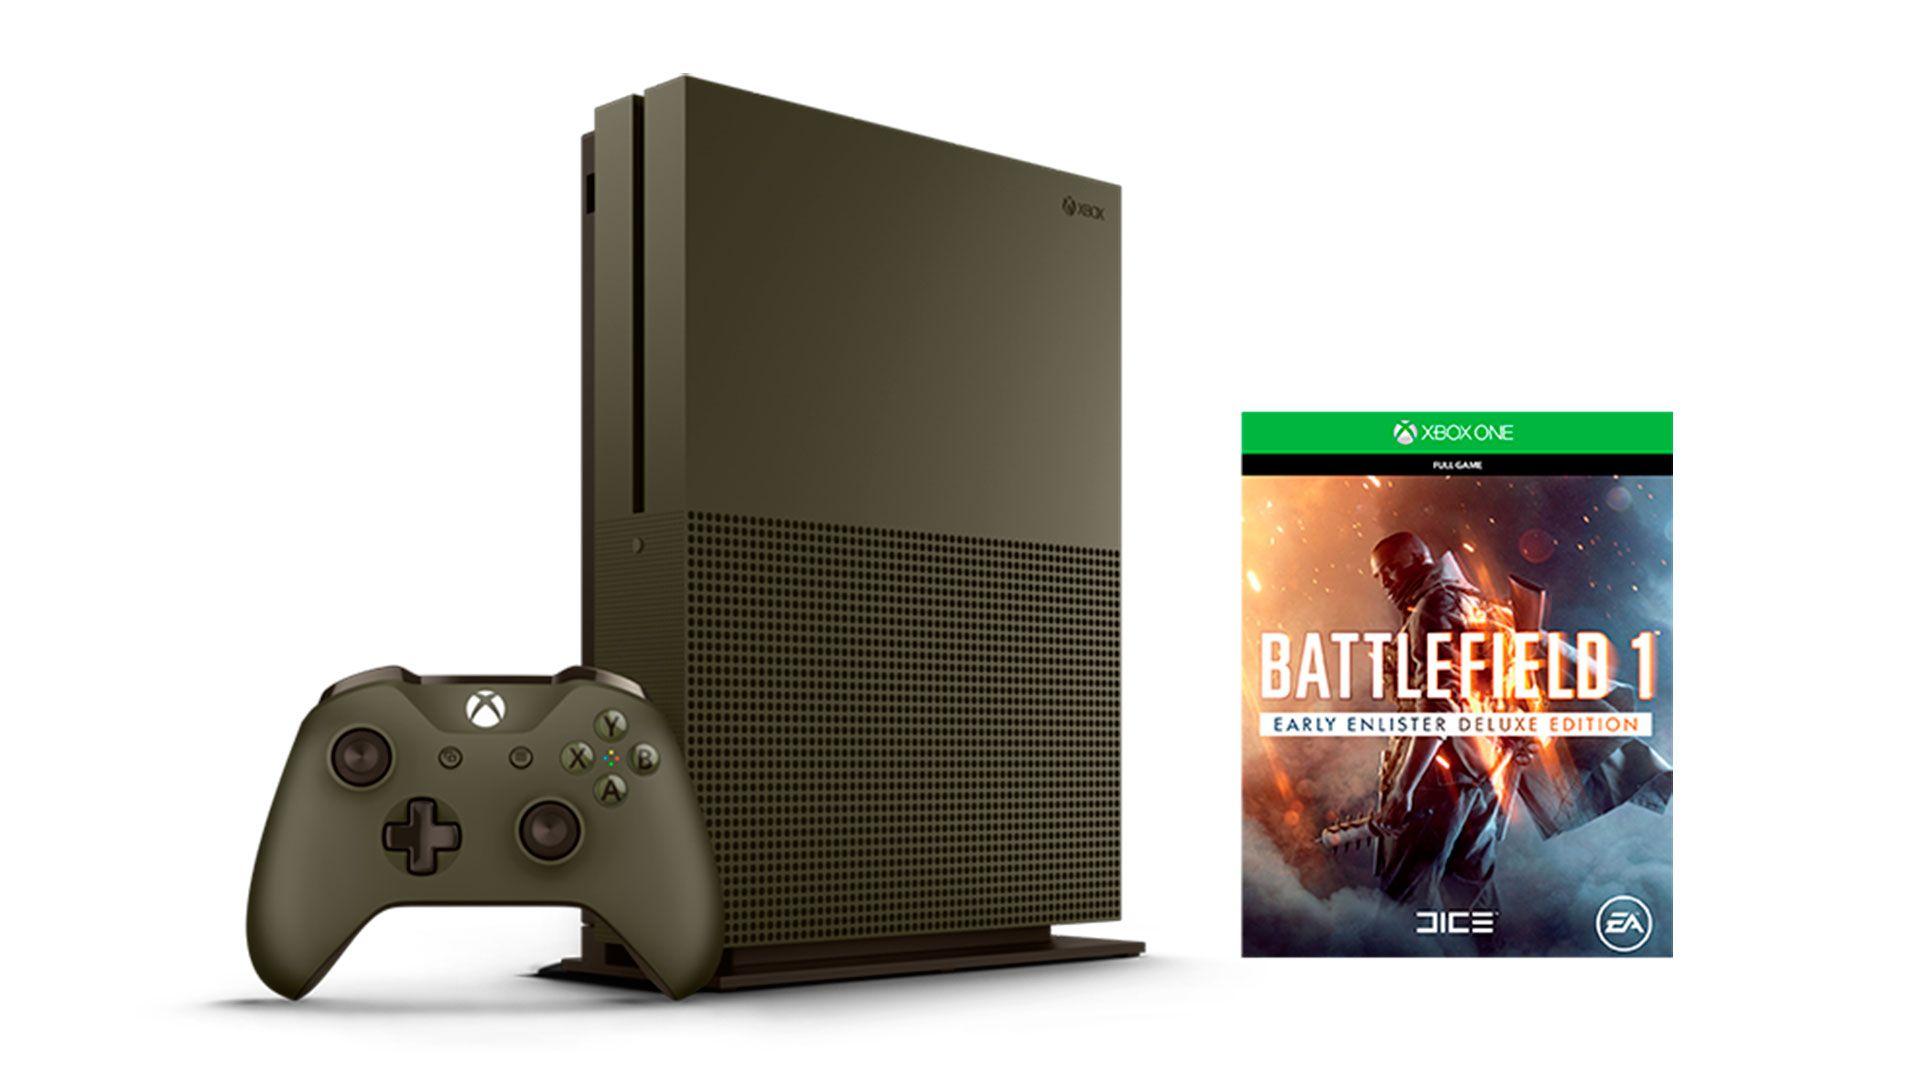 Xbox One S 1Tb Battlefield 1 приставка специальной серии [SXO1SEB]